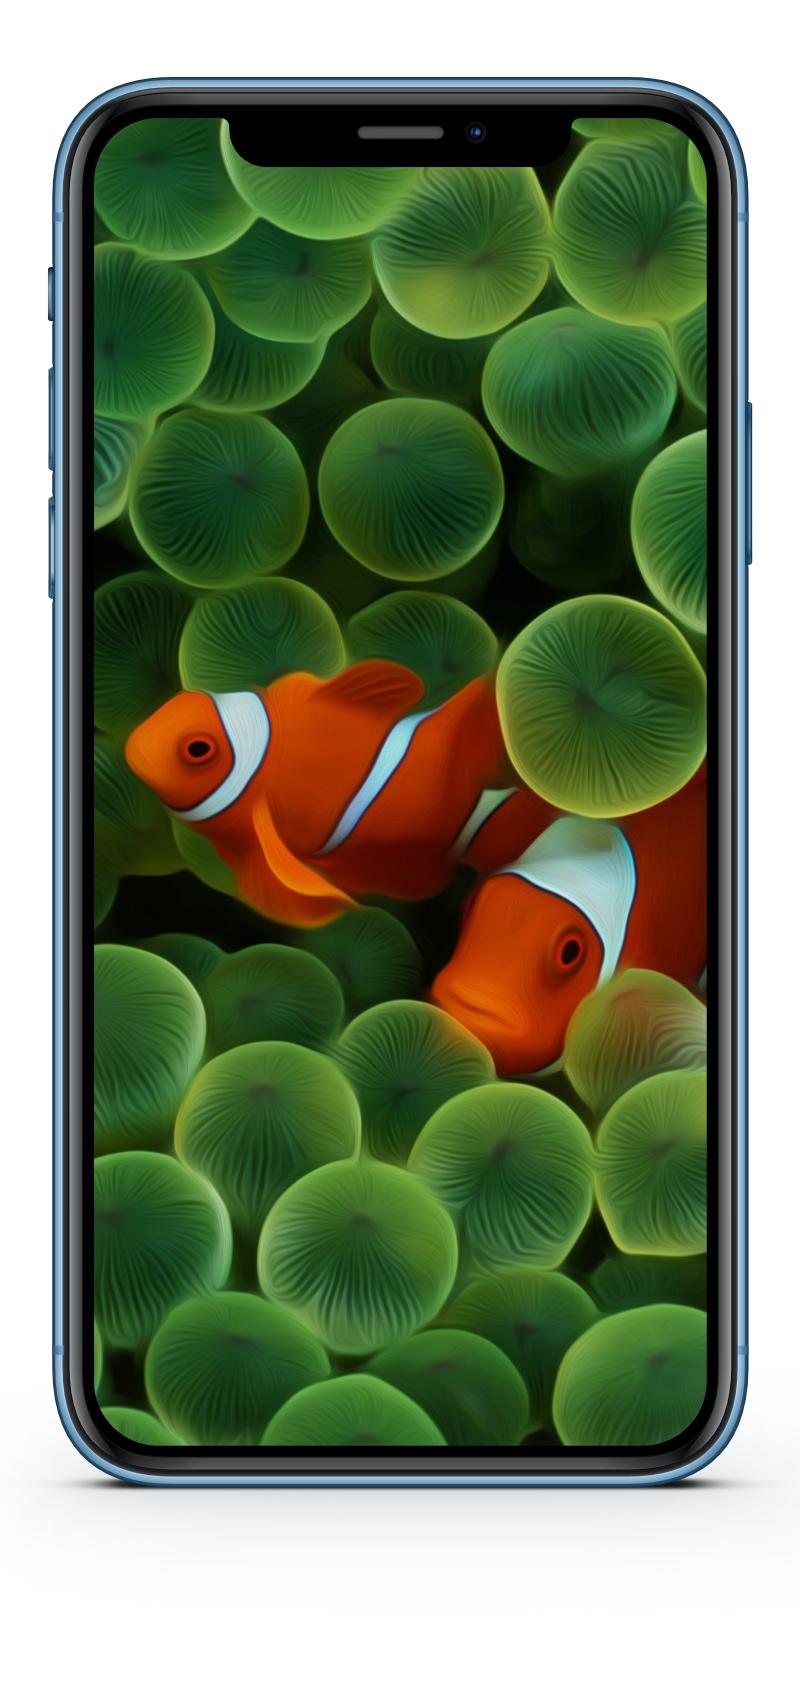 "Hintergrundbild (Wallpaper) ""Originial iPhone"" (iOS 1) optimiert für iPhone XR"